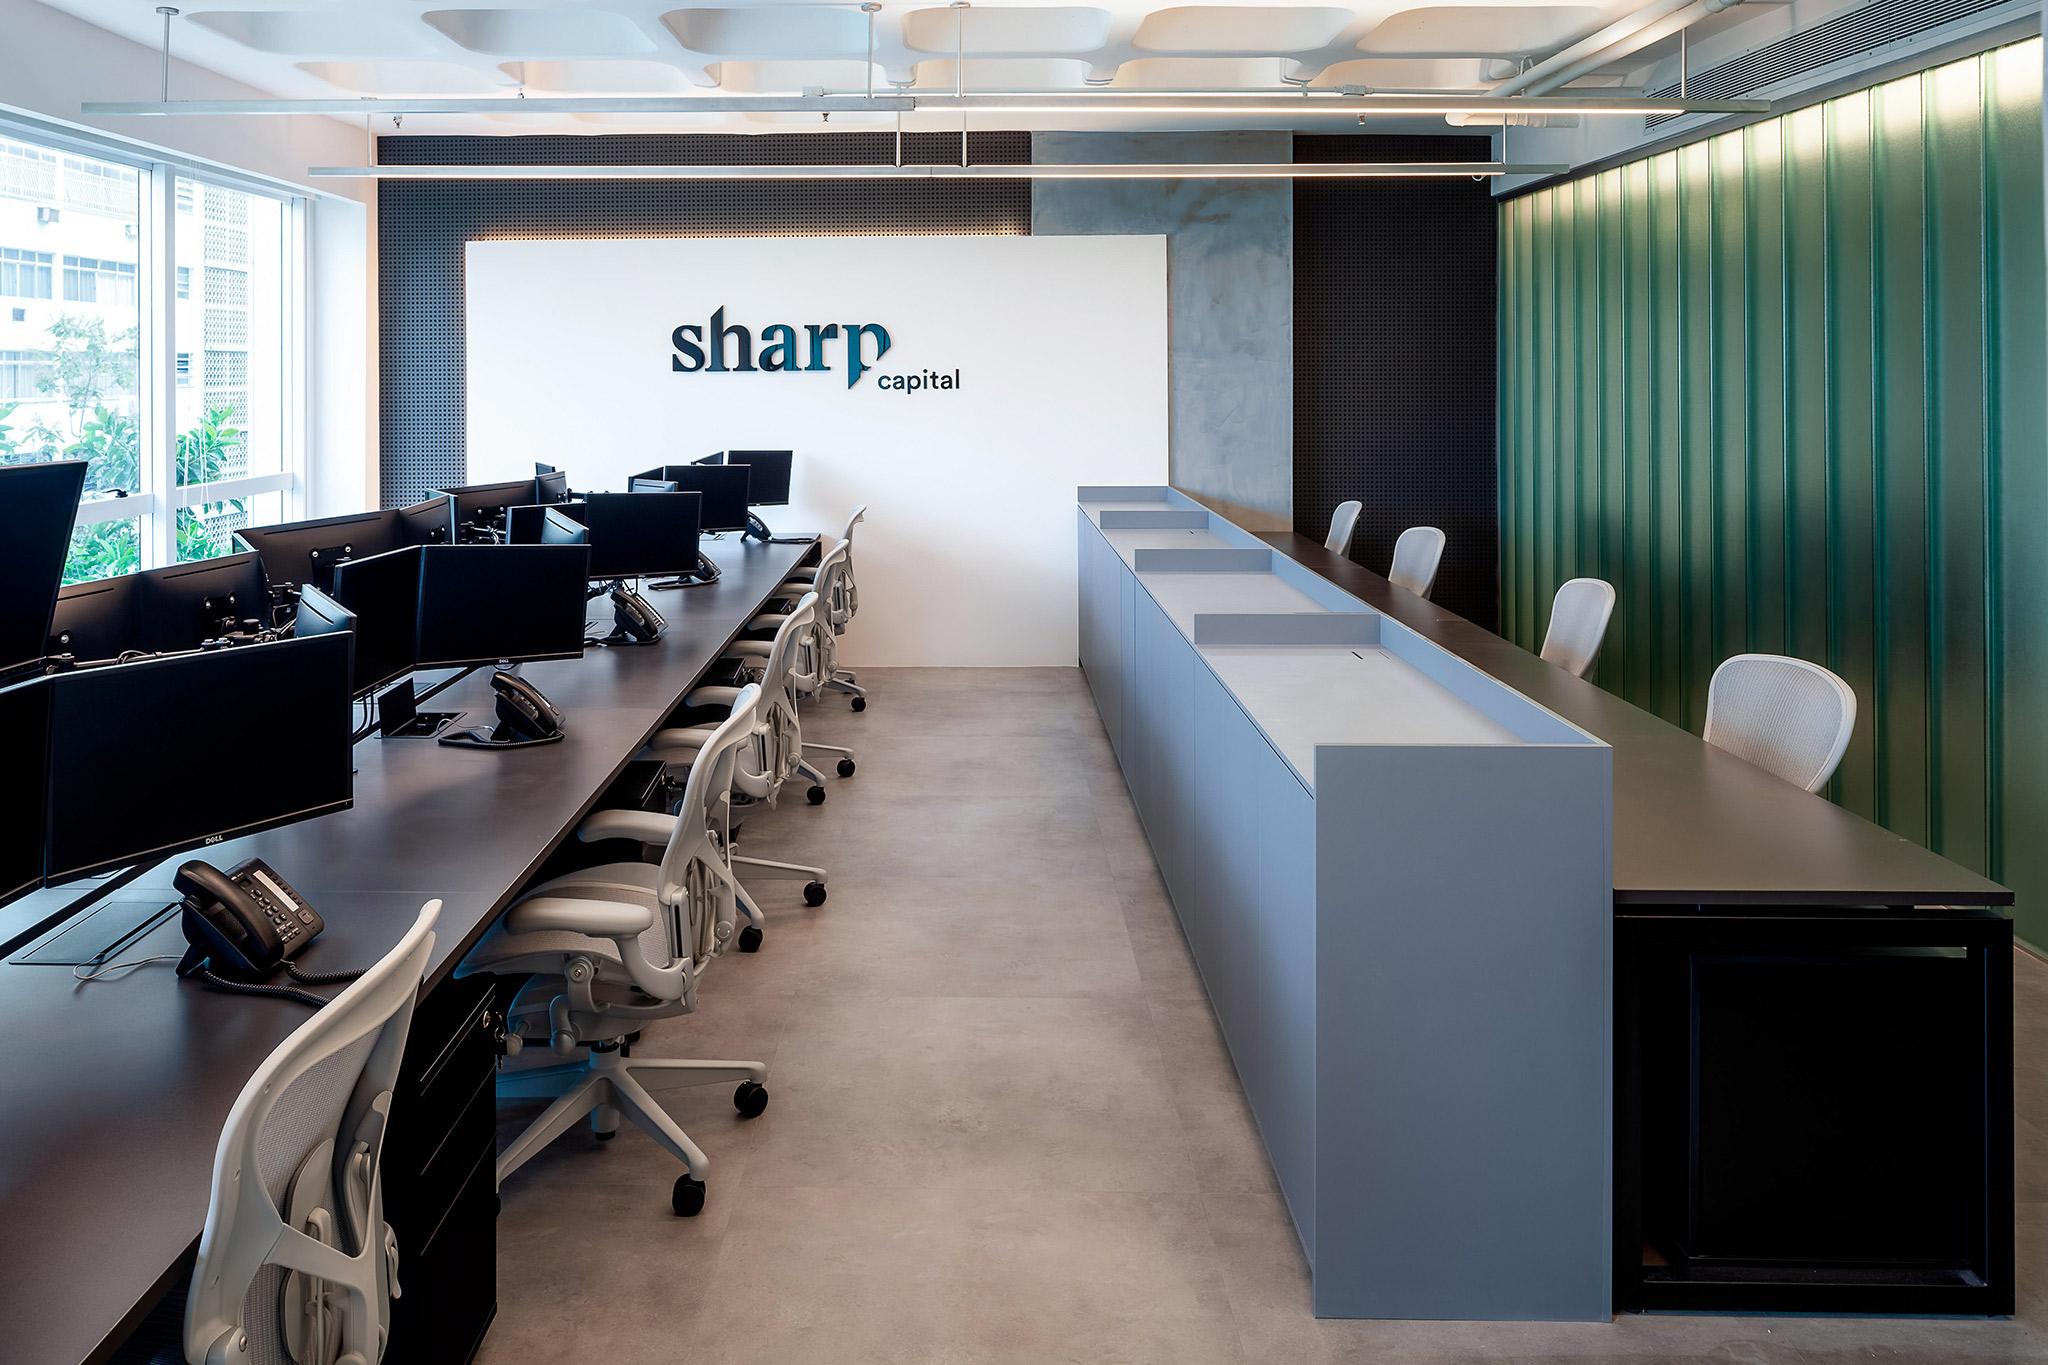 2 – Sharps